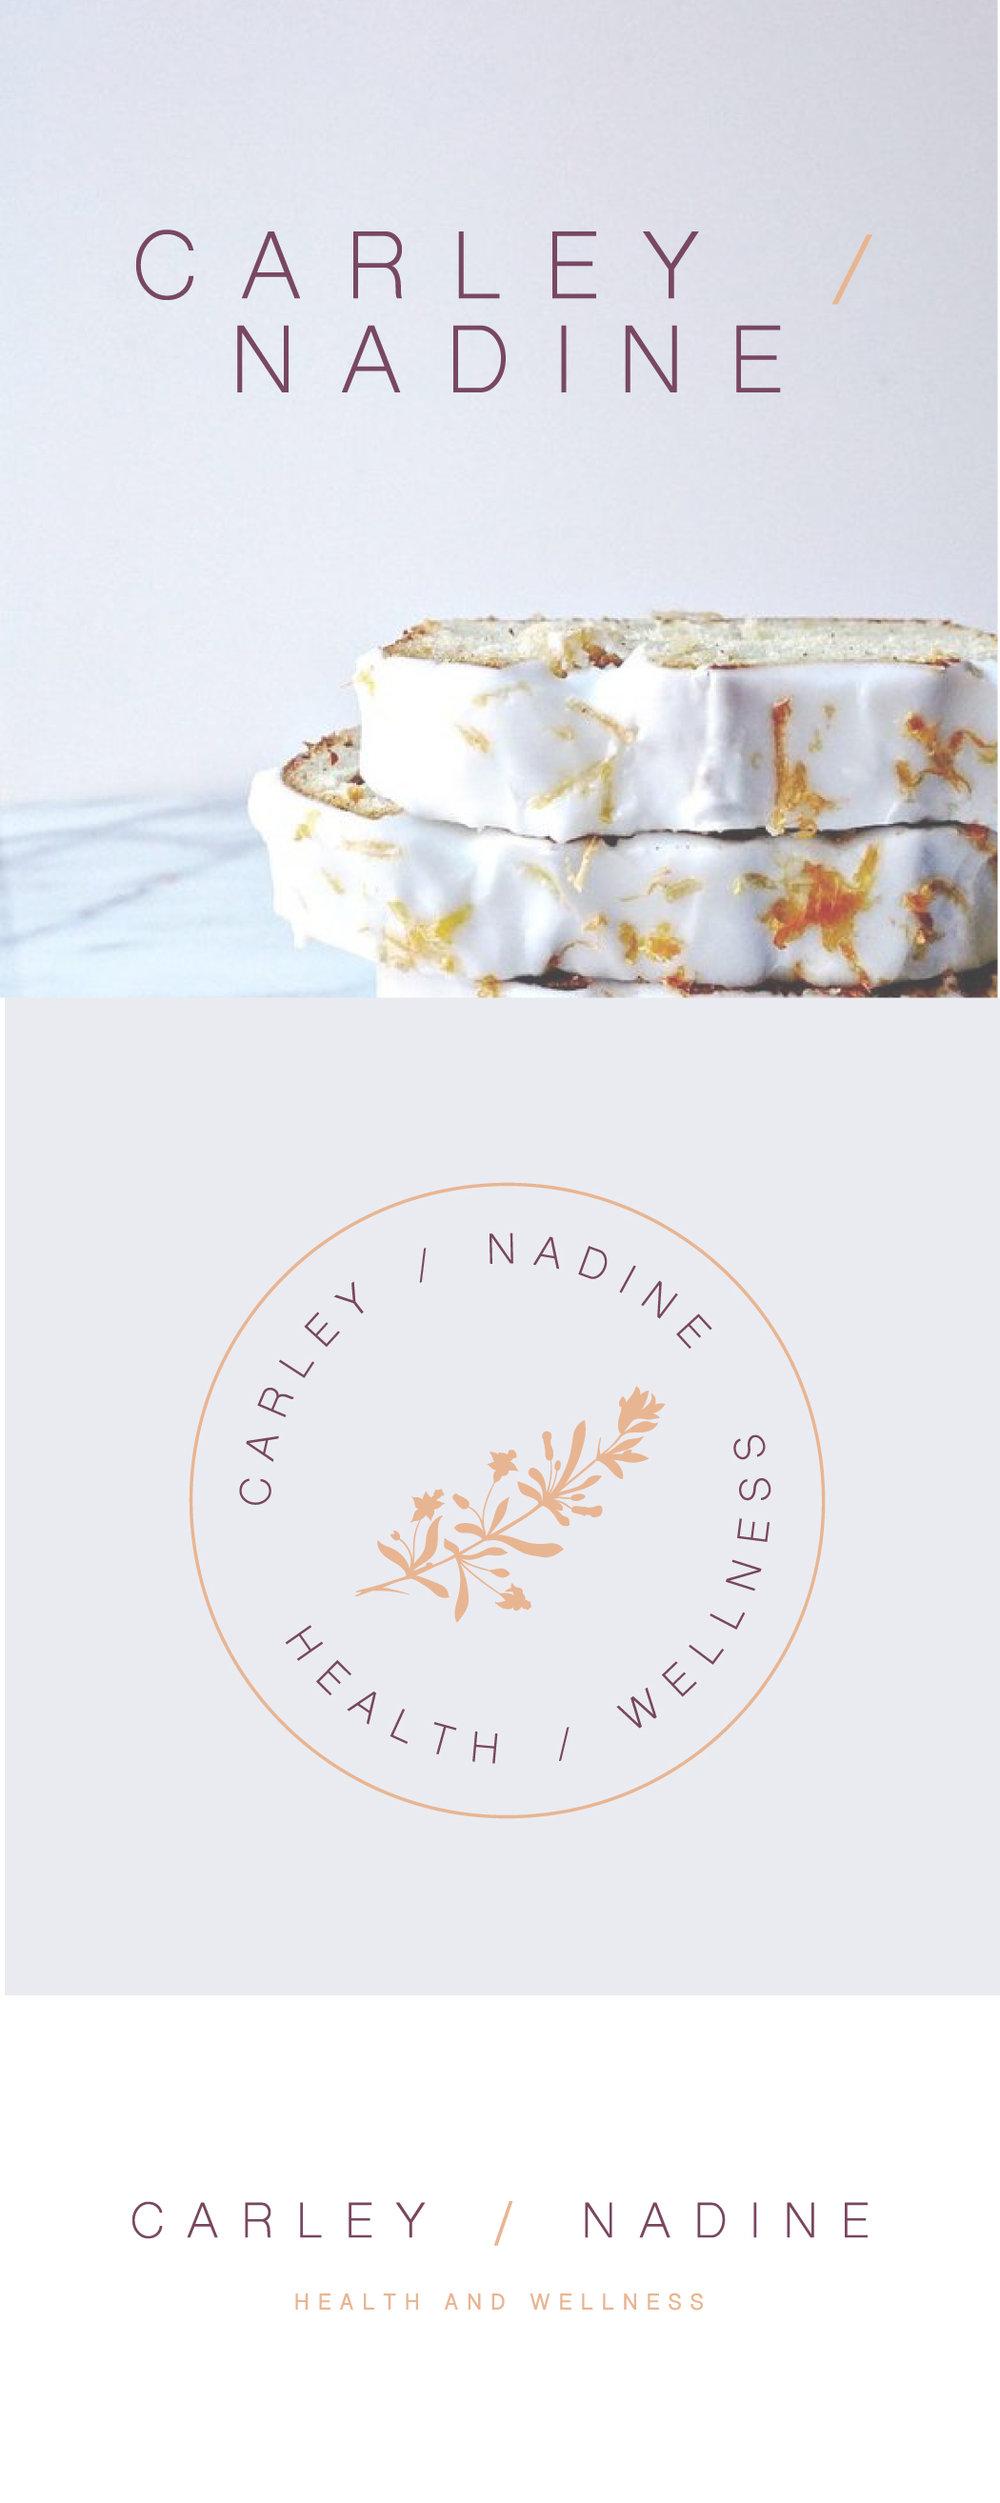 Carley-Nadine-1.jpg